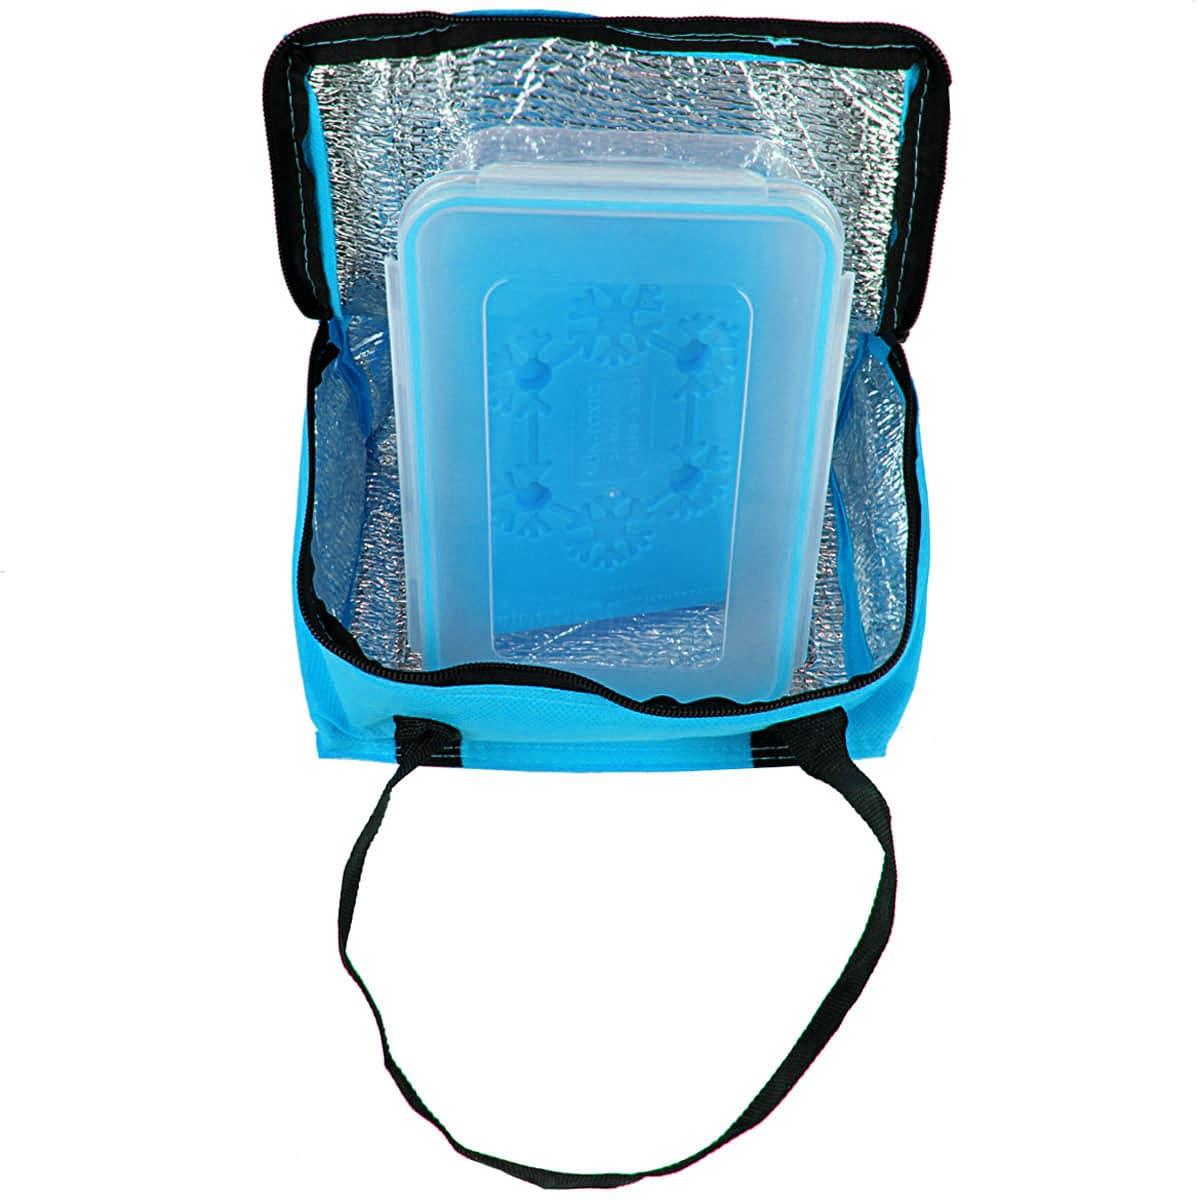 10_70511_1-Isothermiki-tsanta-Lunch-bag-mple-akamatra-b